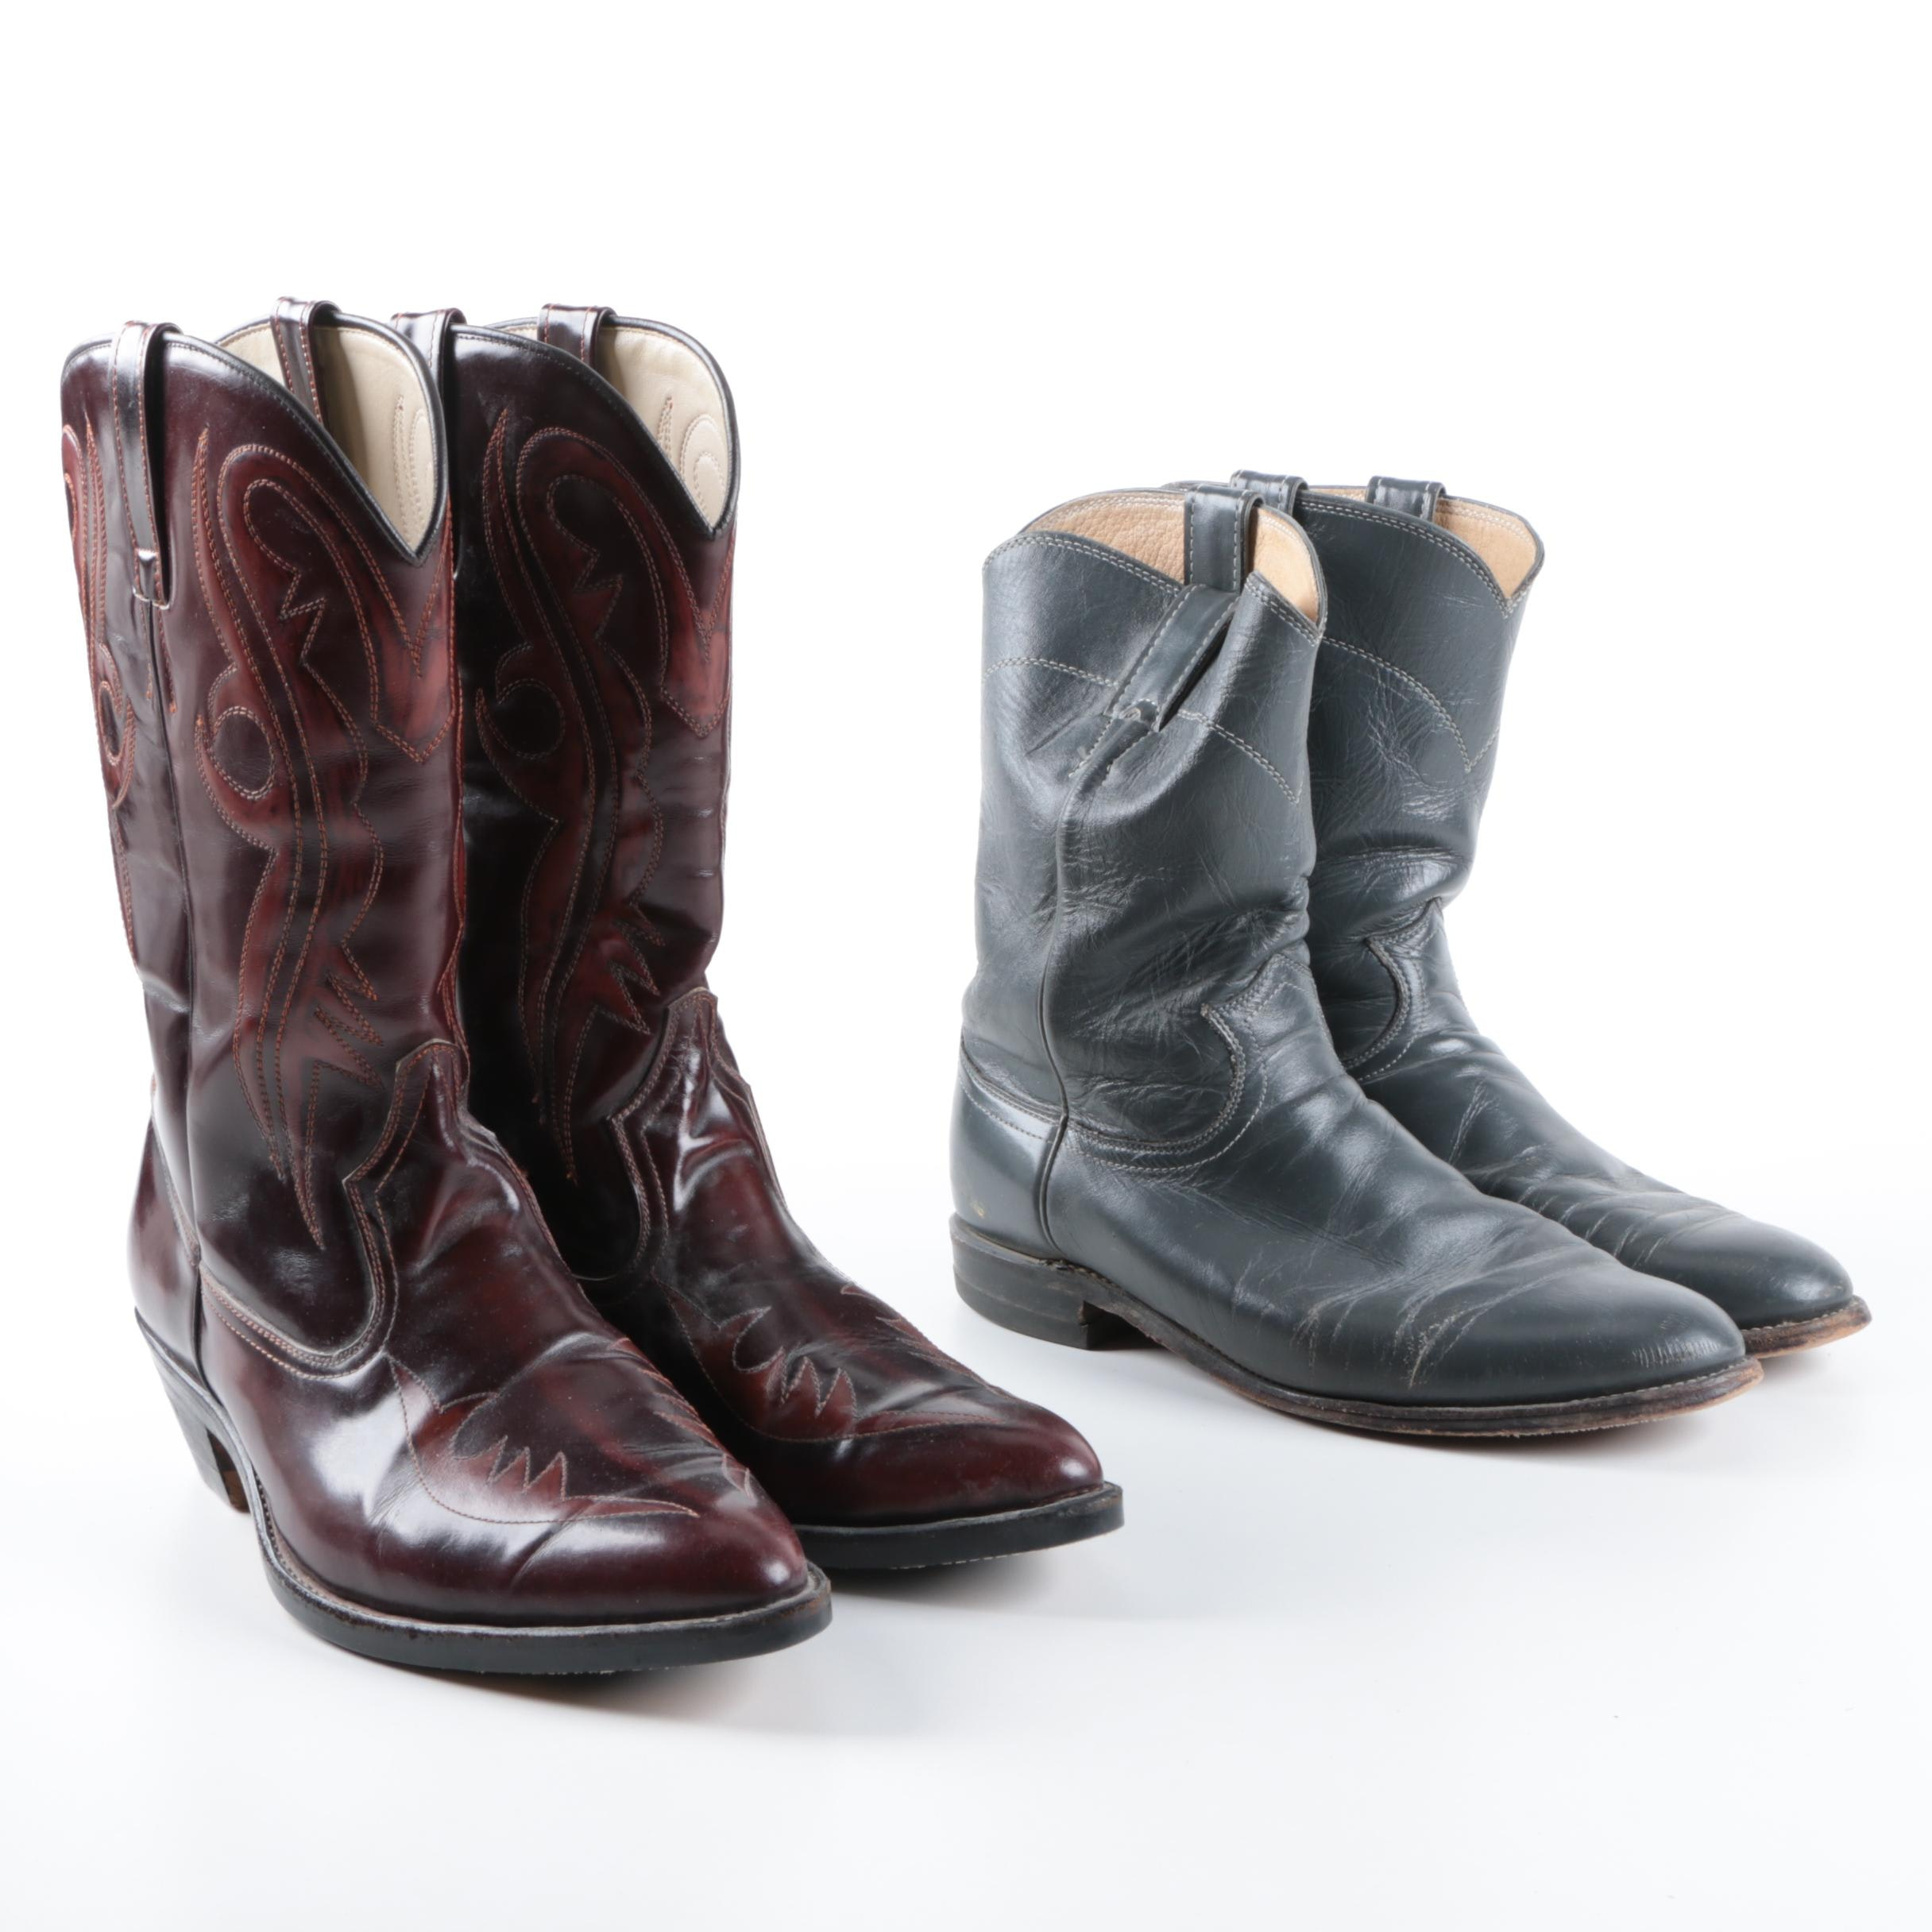 Men's Tony Lama and Justin Cowboy Boots